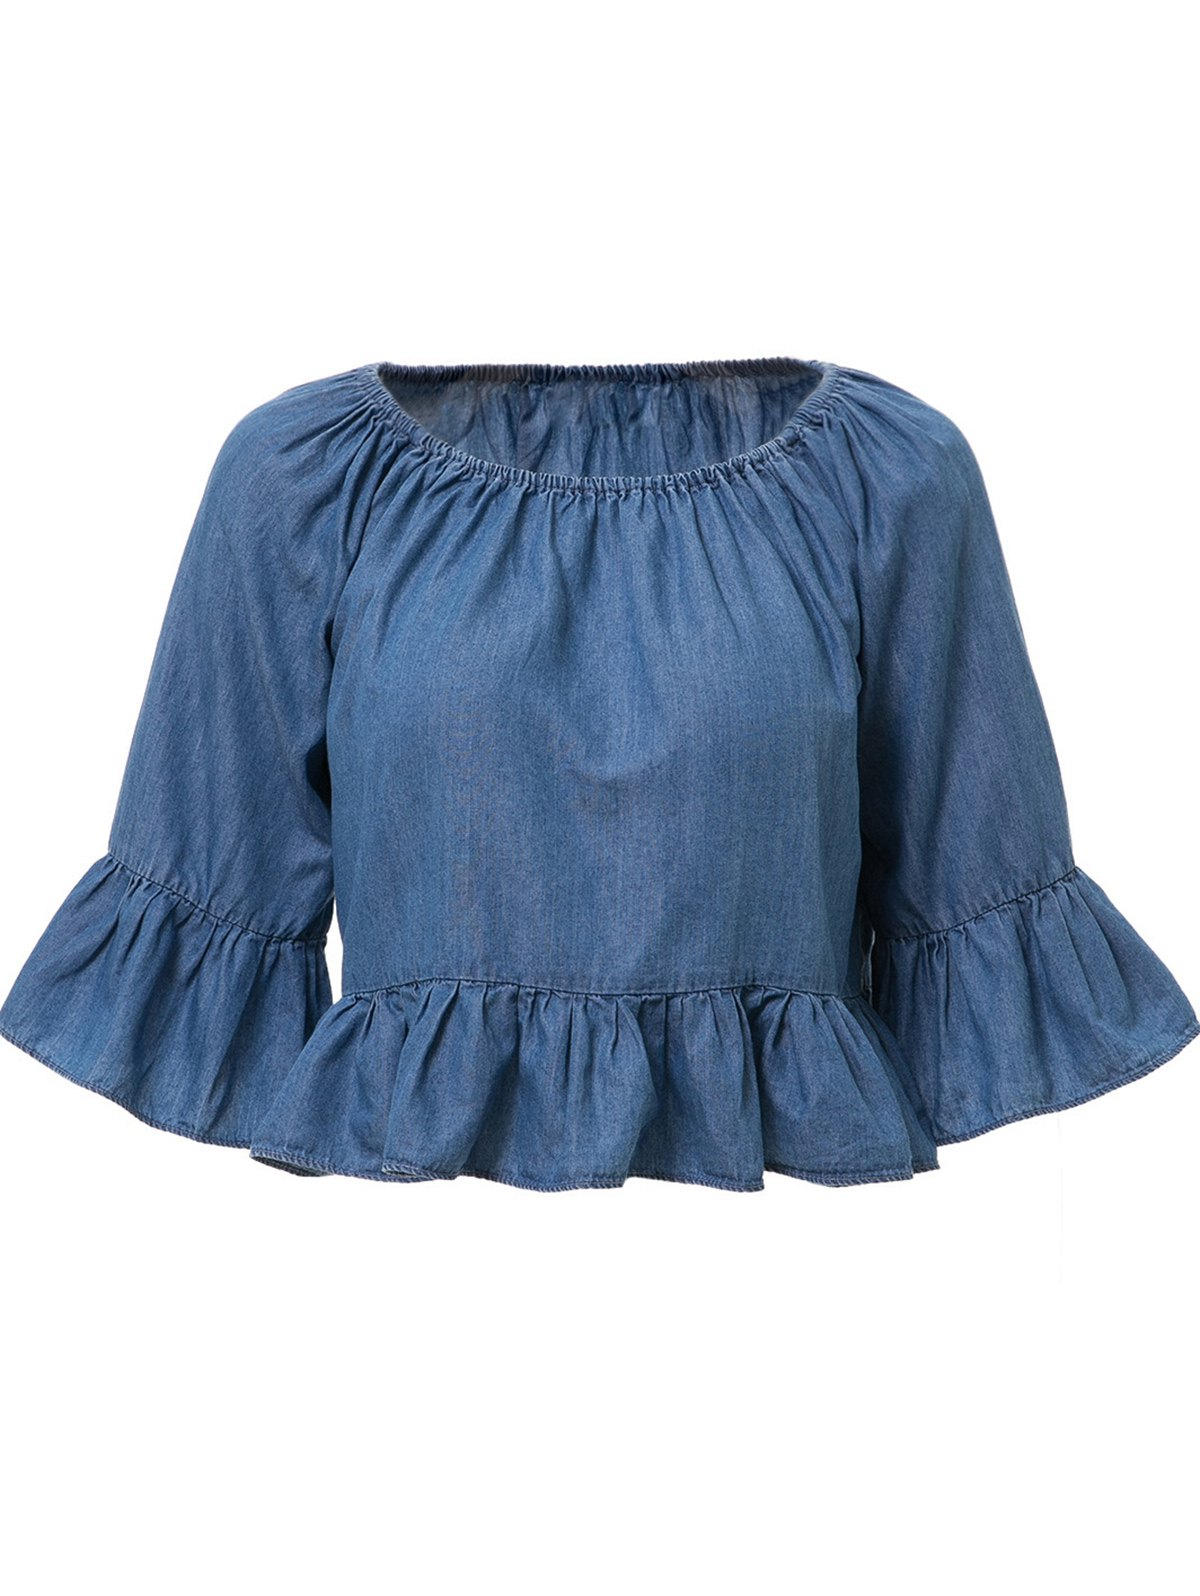 Slash Neck Bleach Wash Founce 3/4 Sleeve T-Shirt